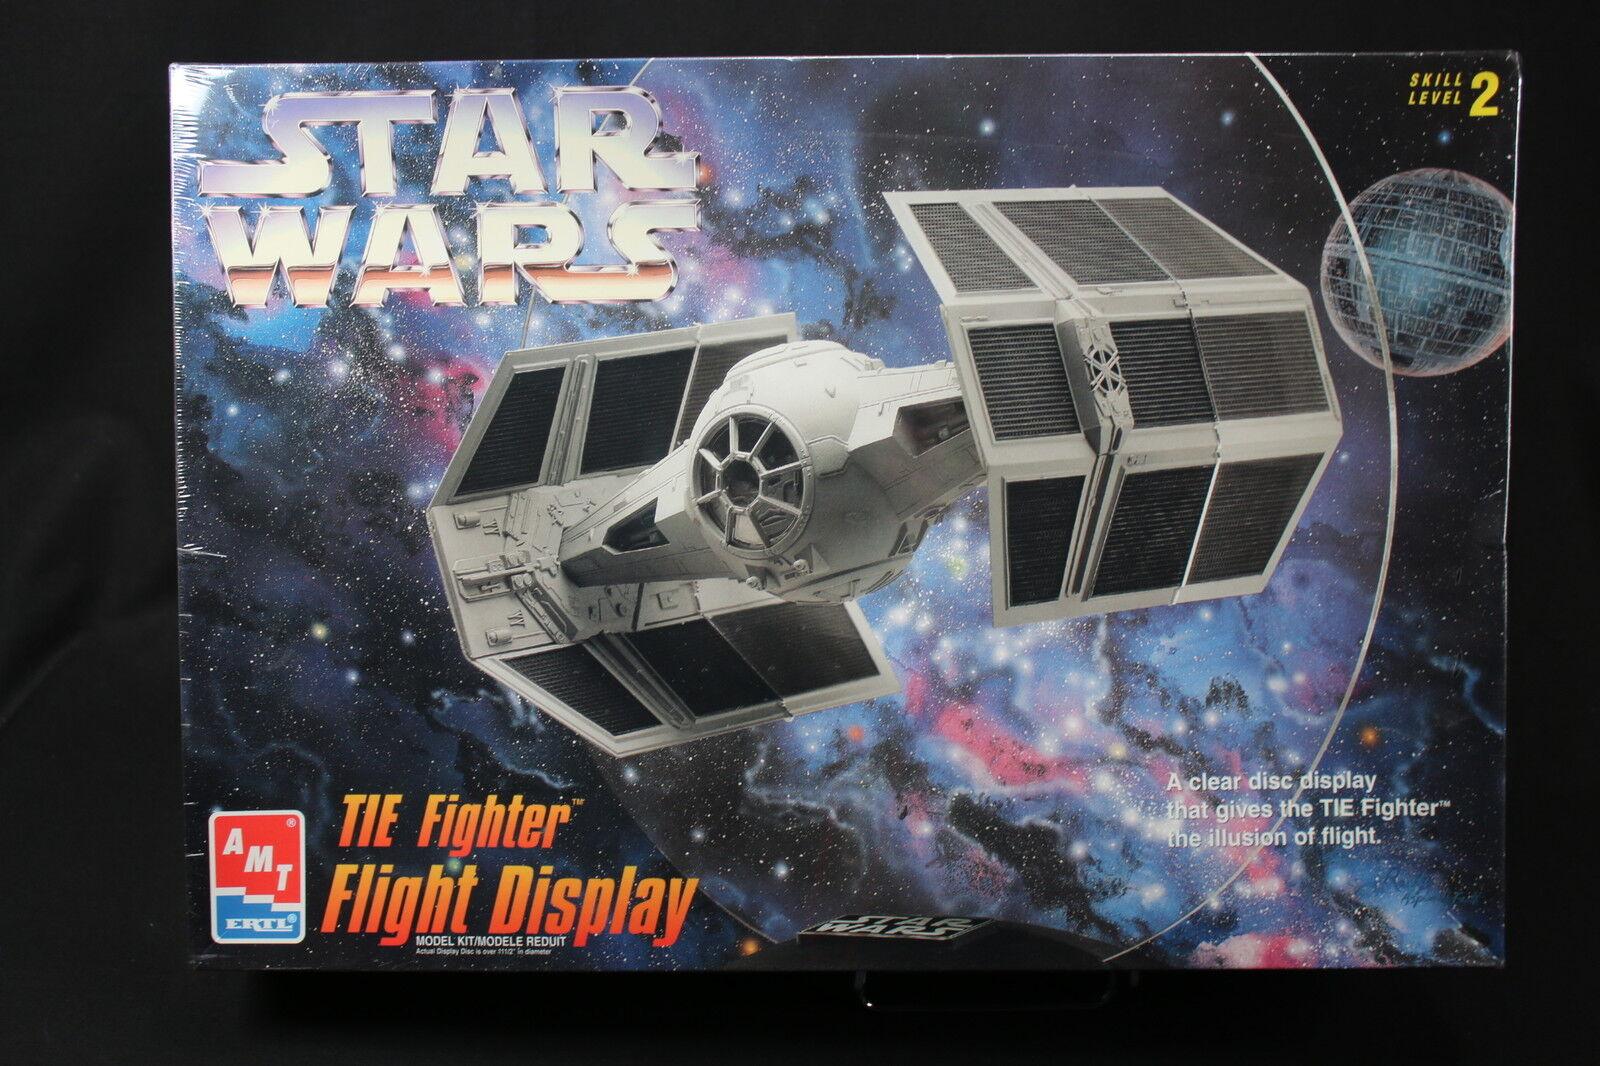 XI014 AMT 29 cm maquette avion 8275 Star Wars TIE Fighter Flight Display